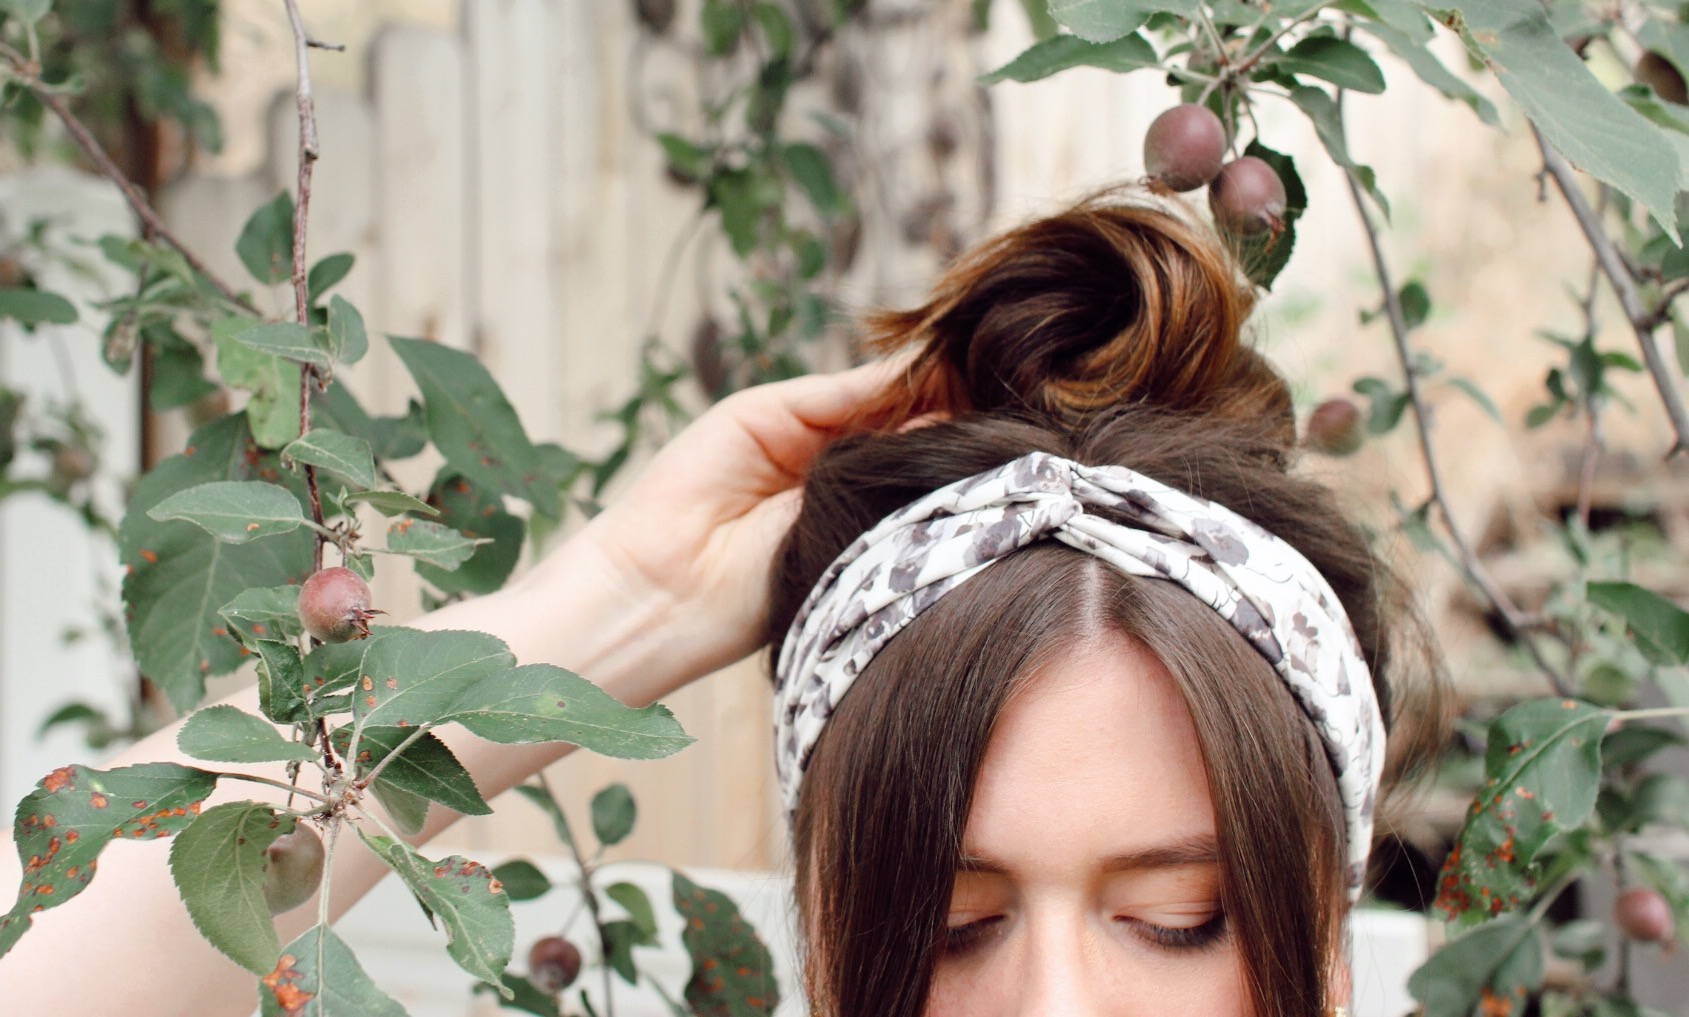 Davines headscarves